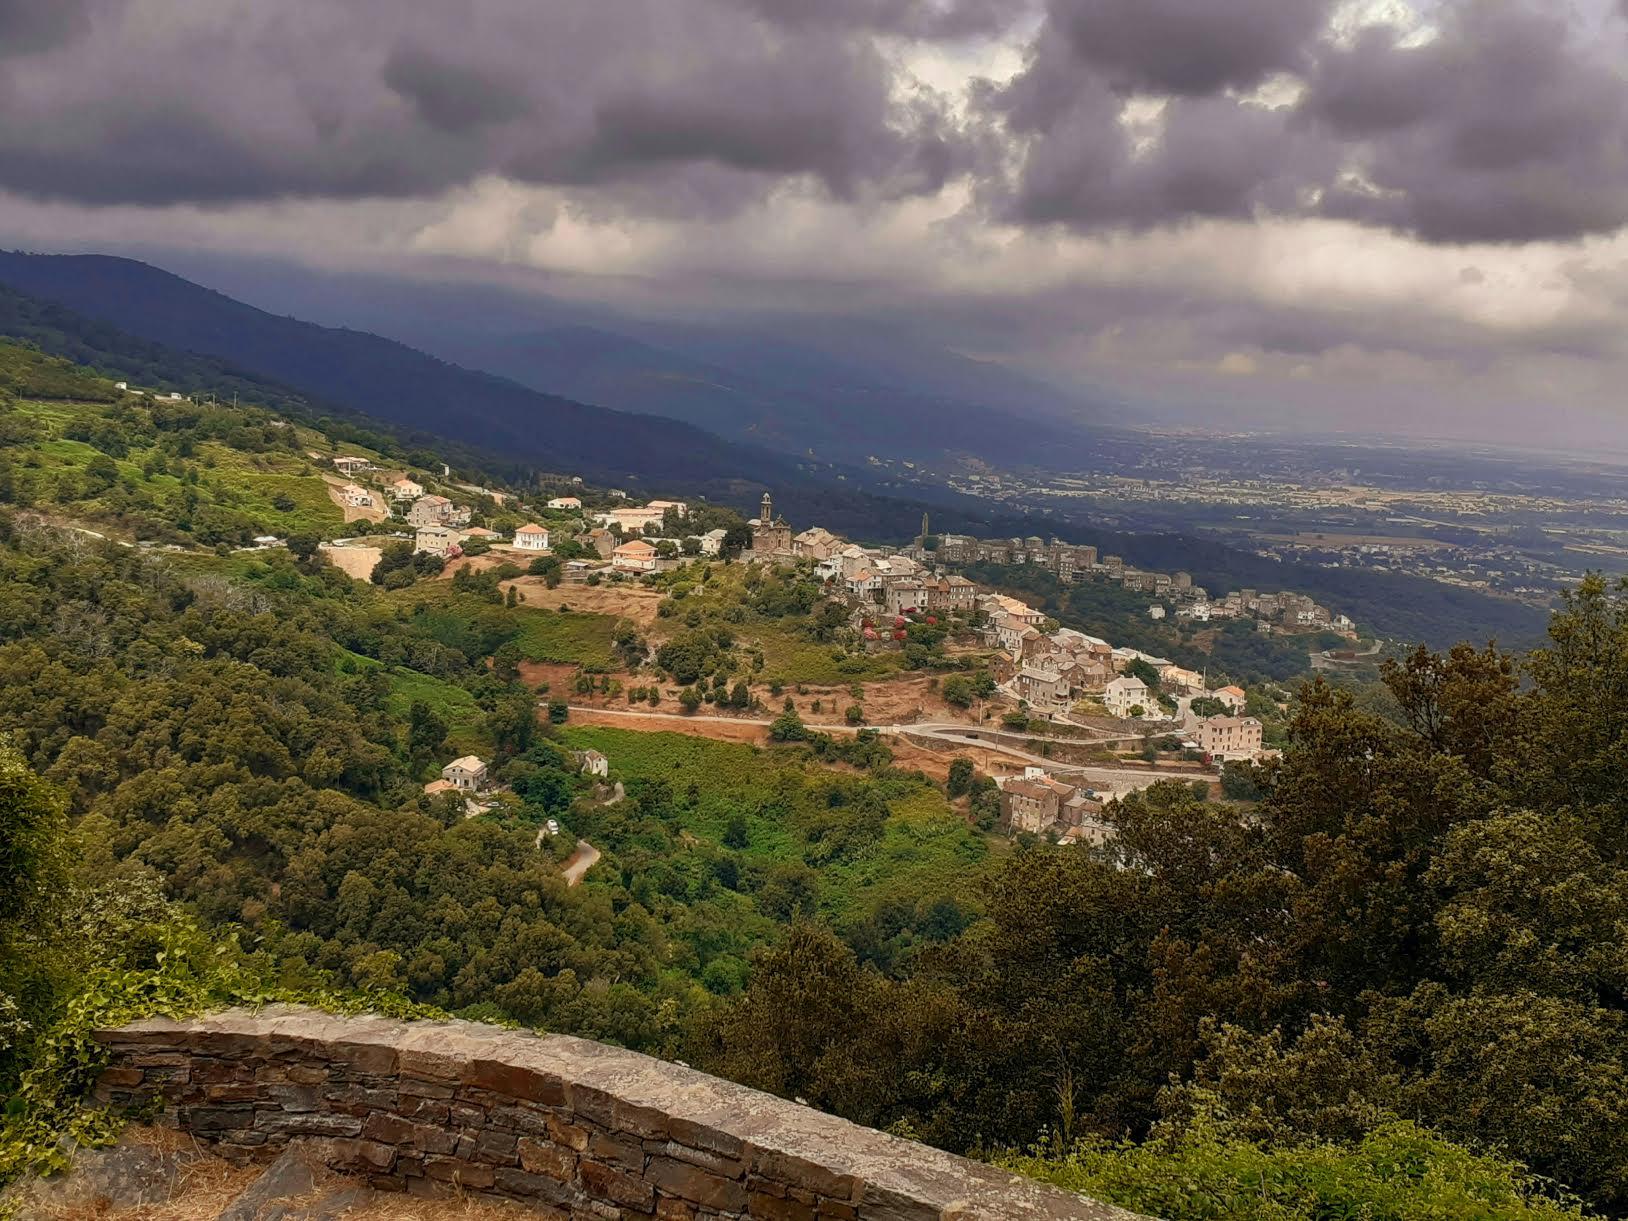 Sorbo Ocagnano e A Vinzulasca visti dà A Penta di Casinca (Françoise Geronimi)